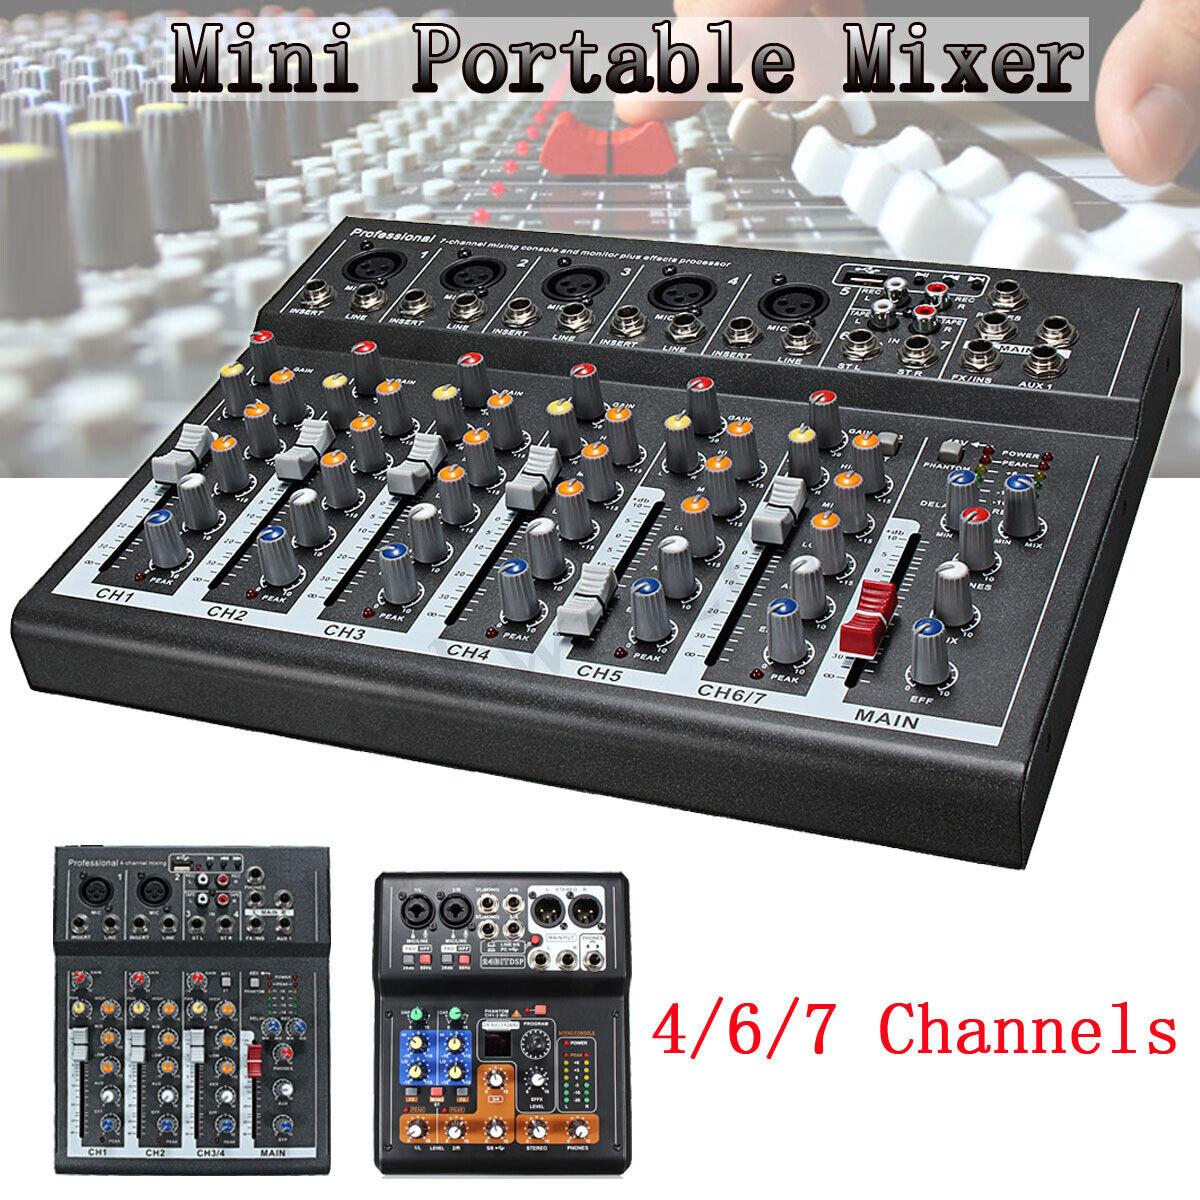 Professional 4 6 7 Channel Line Live Mixing Studio Audio Sound Mixer Console